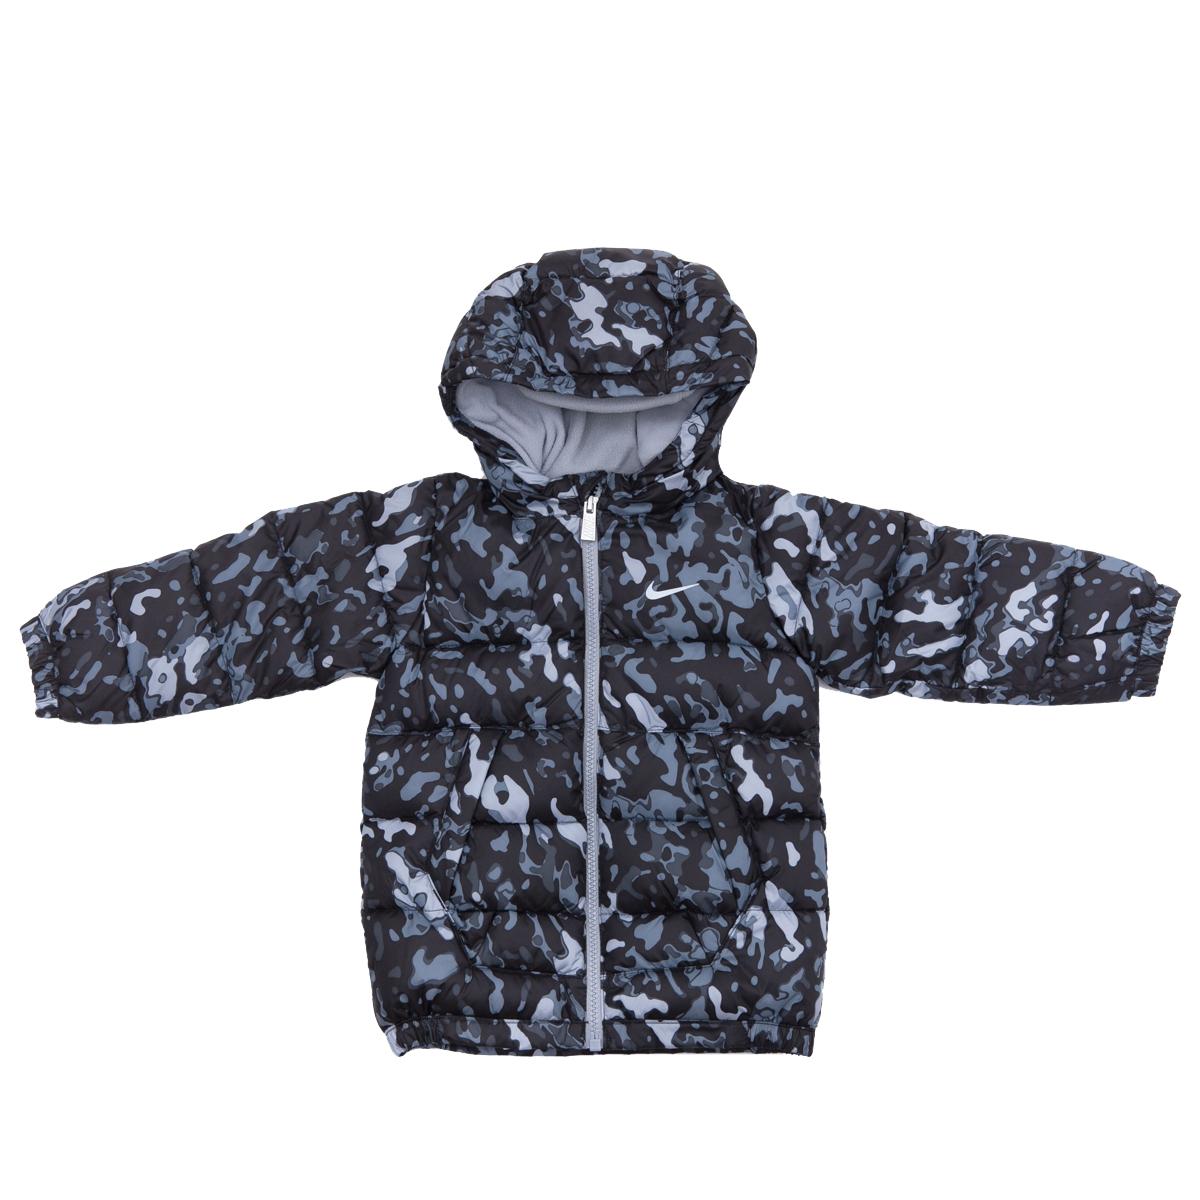 NIKE - Βρεφικό μπουφάν Nike γκρι-μαύρο παιδικά baby ρούχα πανωφόρια